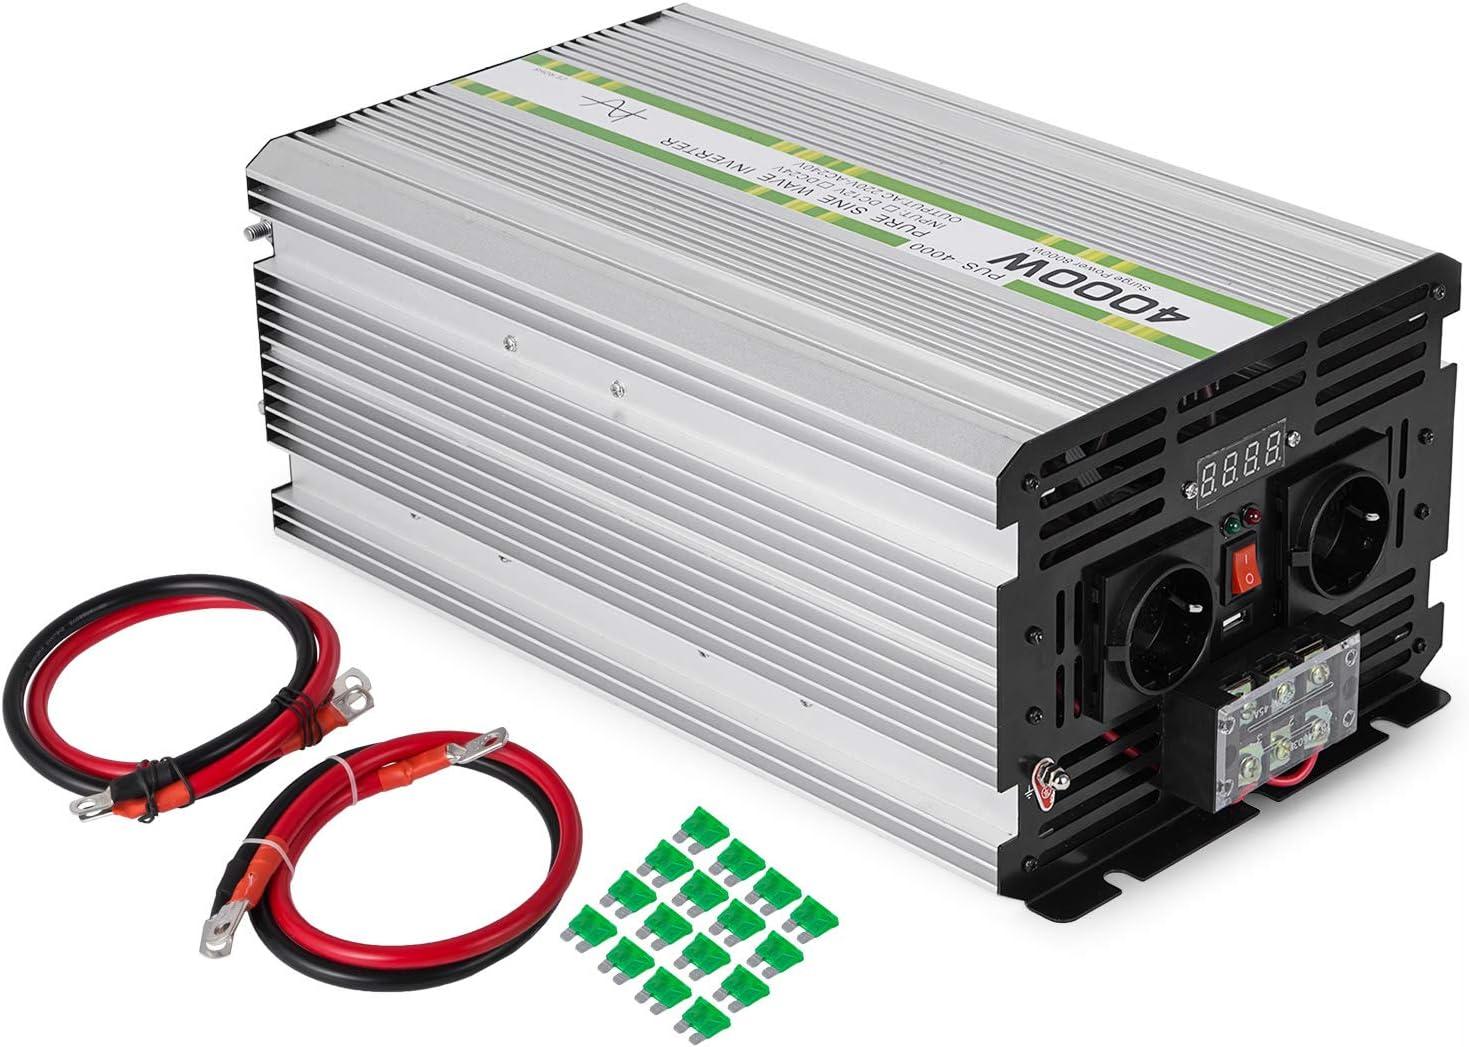 Mophorn Inversor de Corriente 12V DC a 230V AC Inversor de Corriente para Coche con Potencia M/áxima de 6000W Inversor de Onda Sinusoidal Modificada con Mando a Distancia y Pantalla LCD